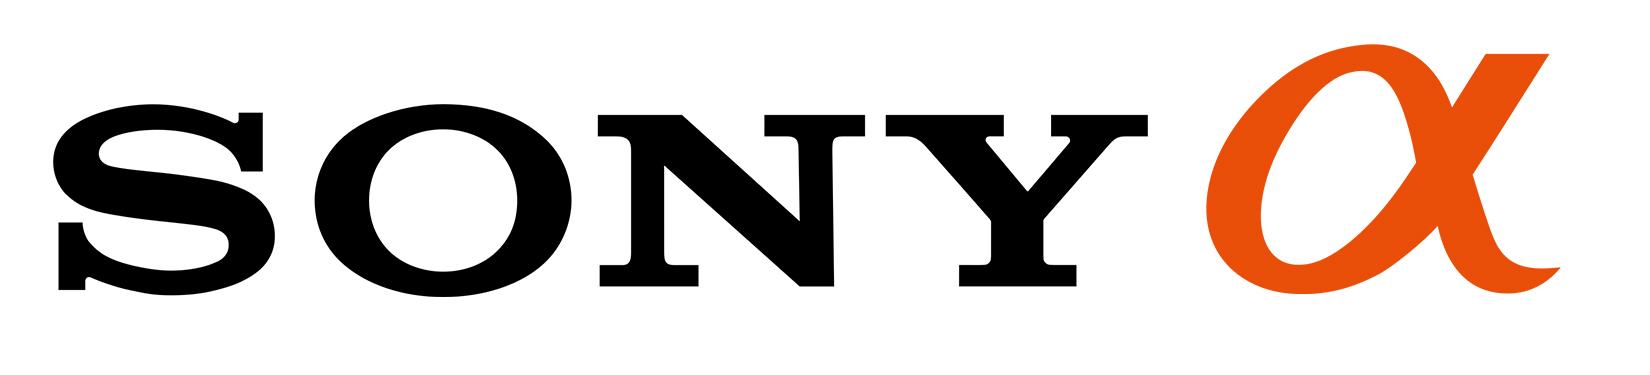 sony alpha logo.jpg